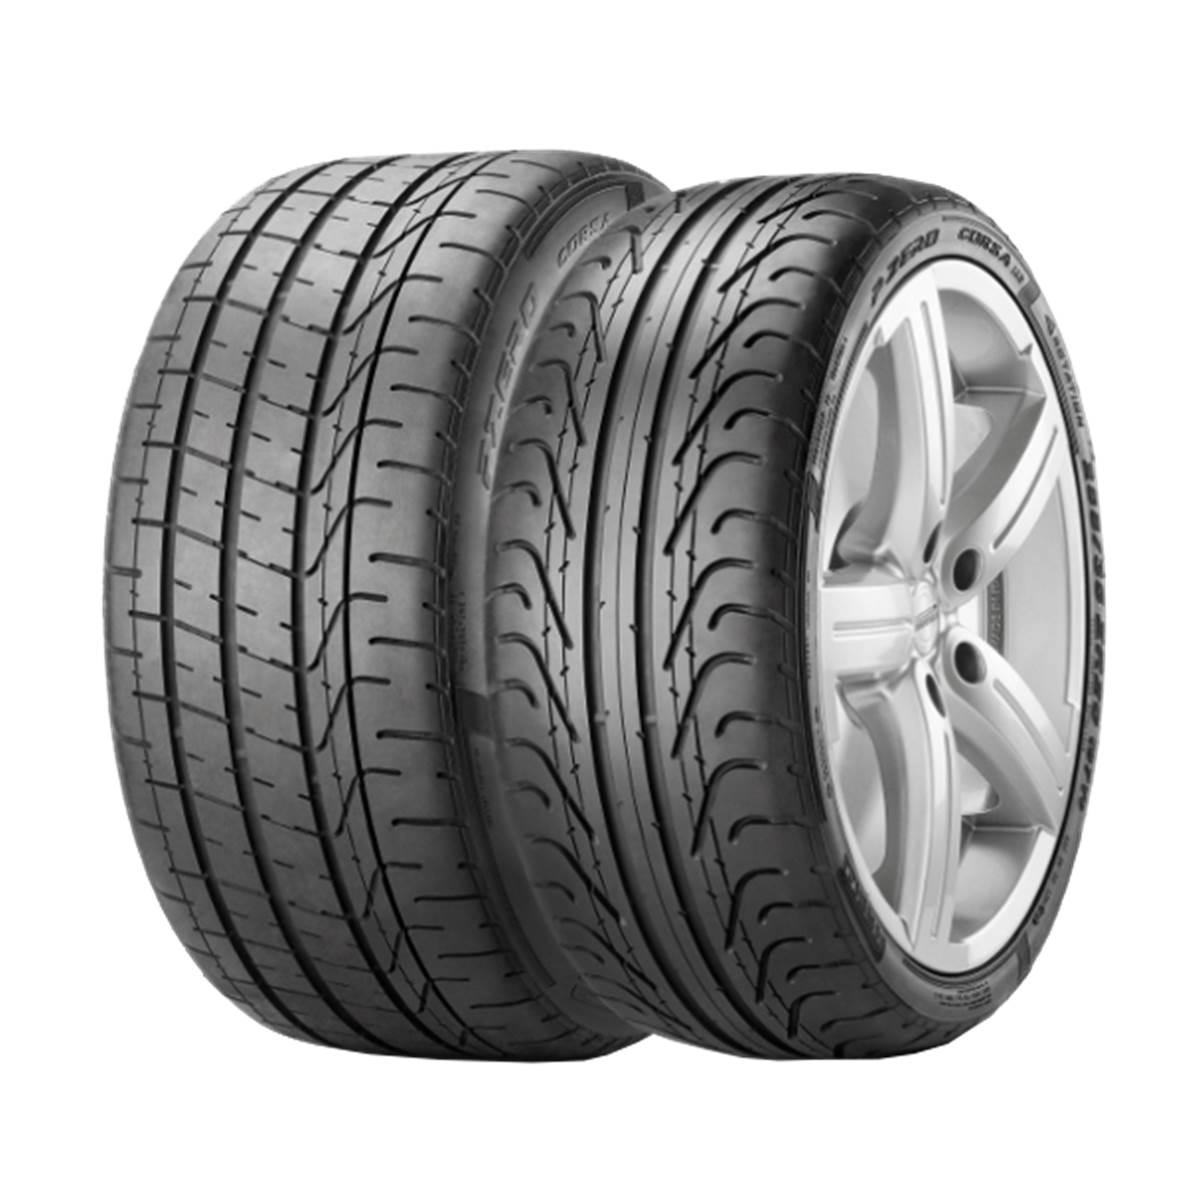 Pneu Pirelli 275/30R20 97Y Pzero Corsa Asimmetrico 2 XL